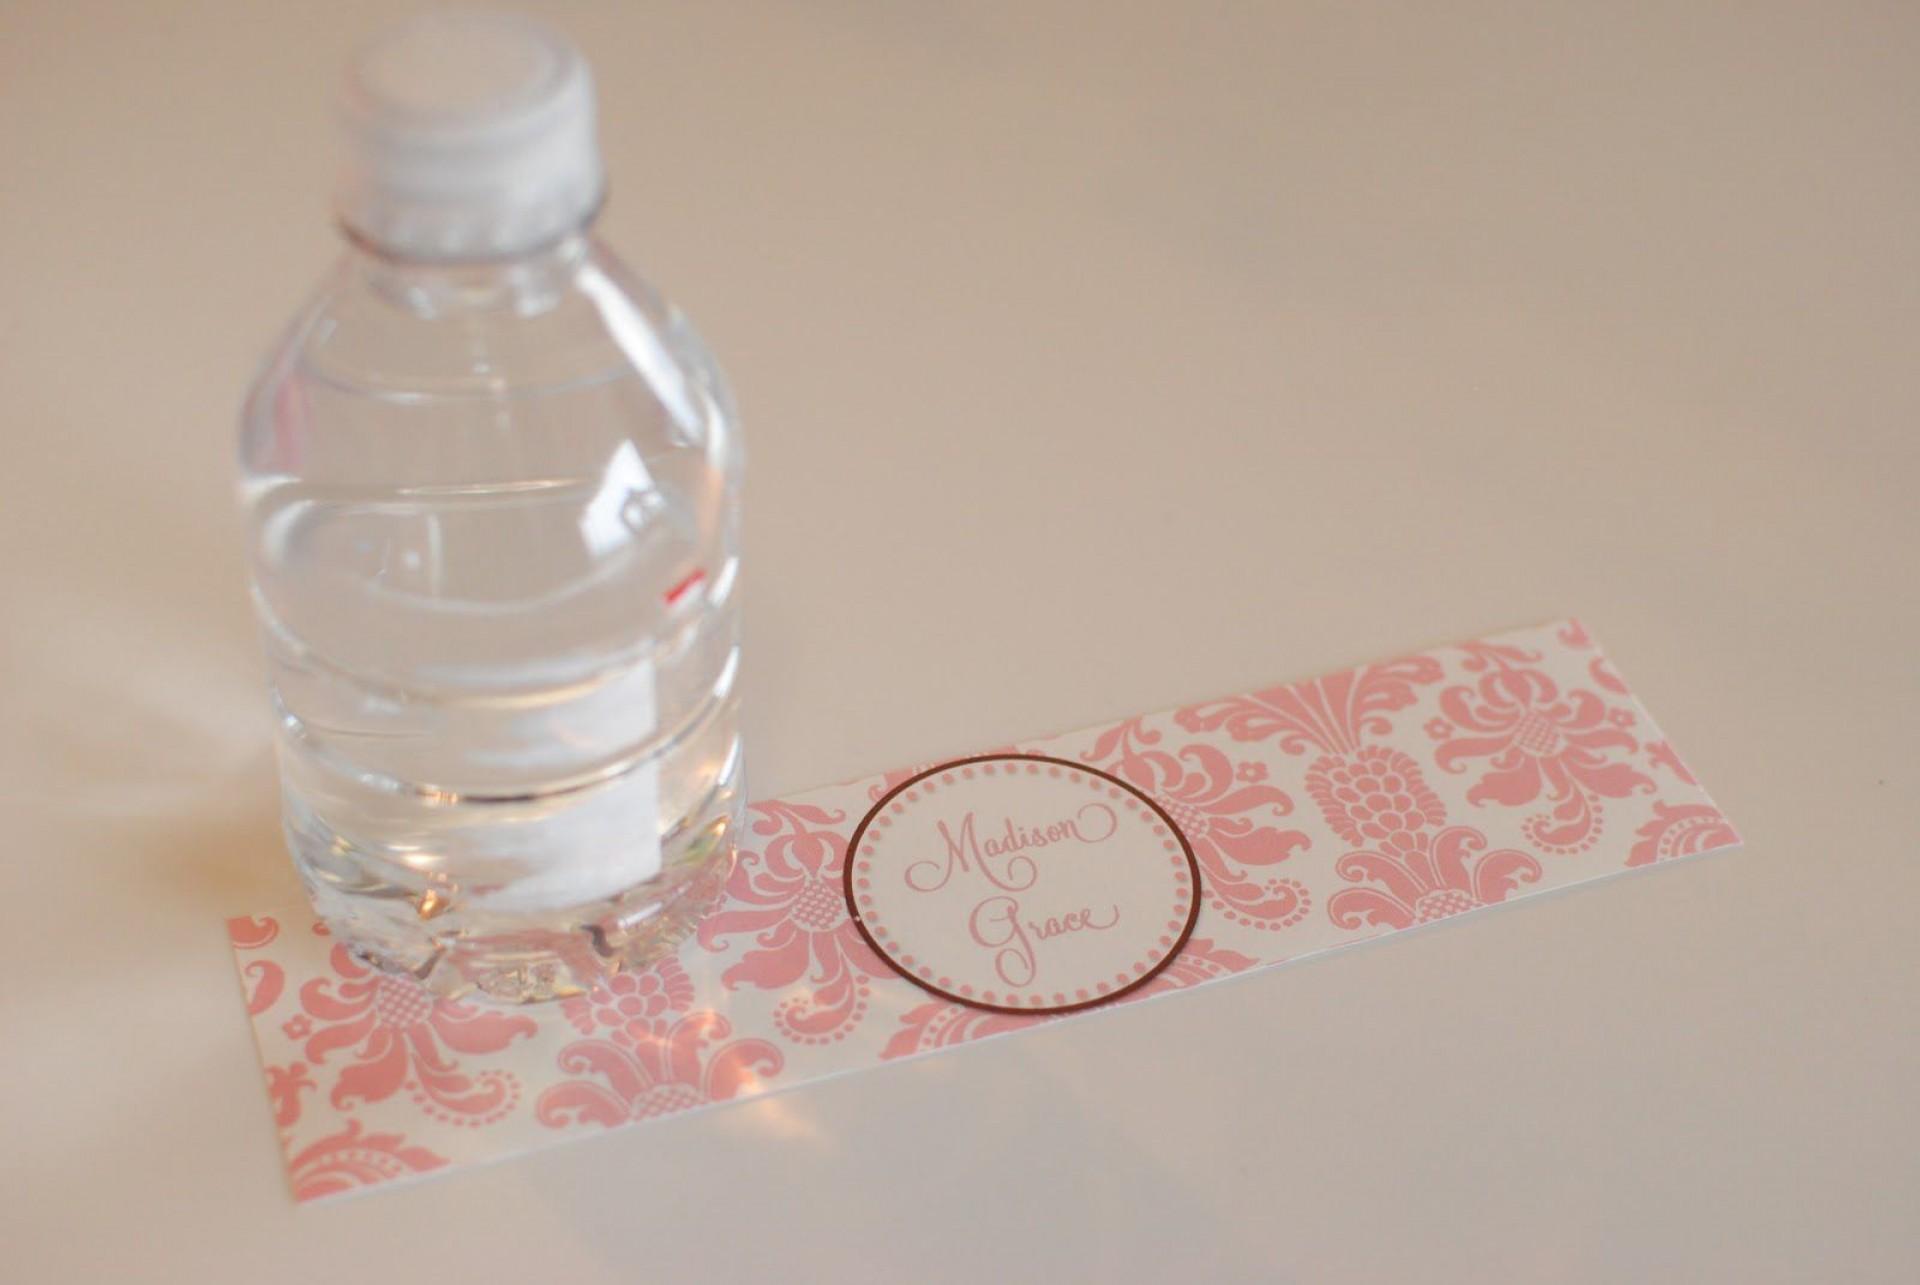 006 Striking Water Bottle Label Template Free Inspiration  Word Superhero Photoshop1920